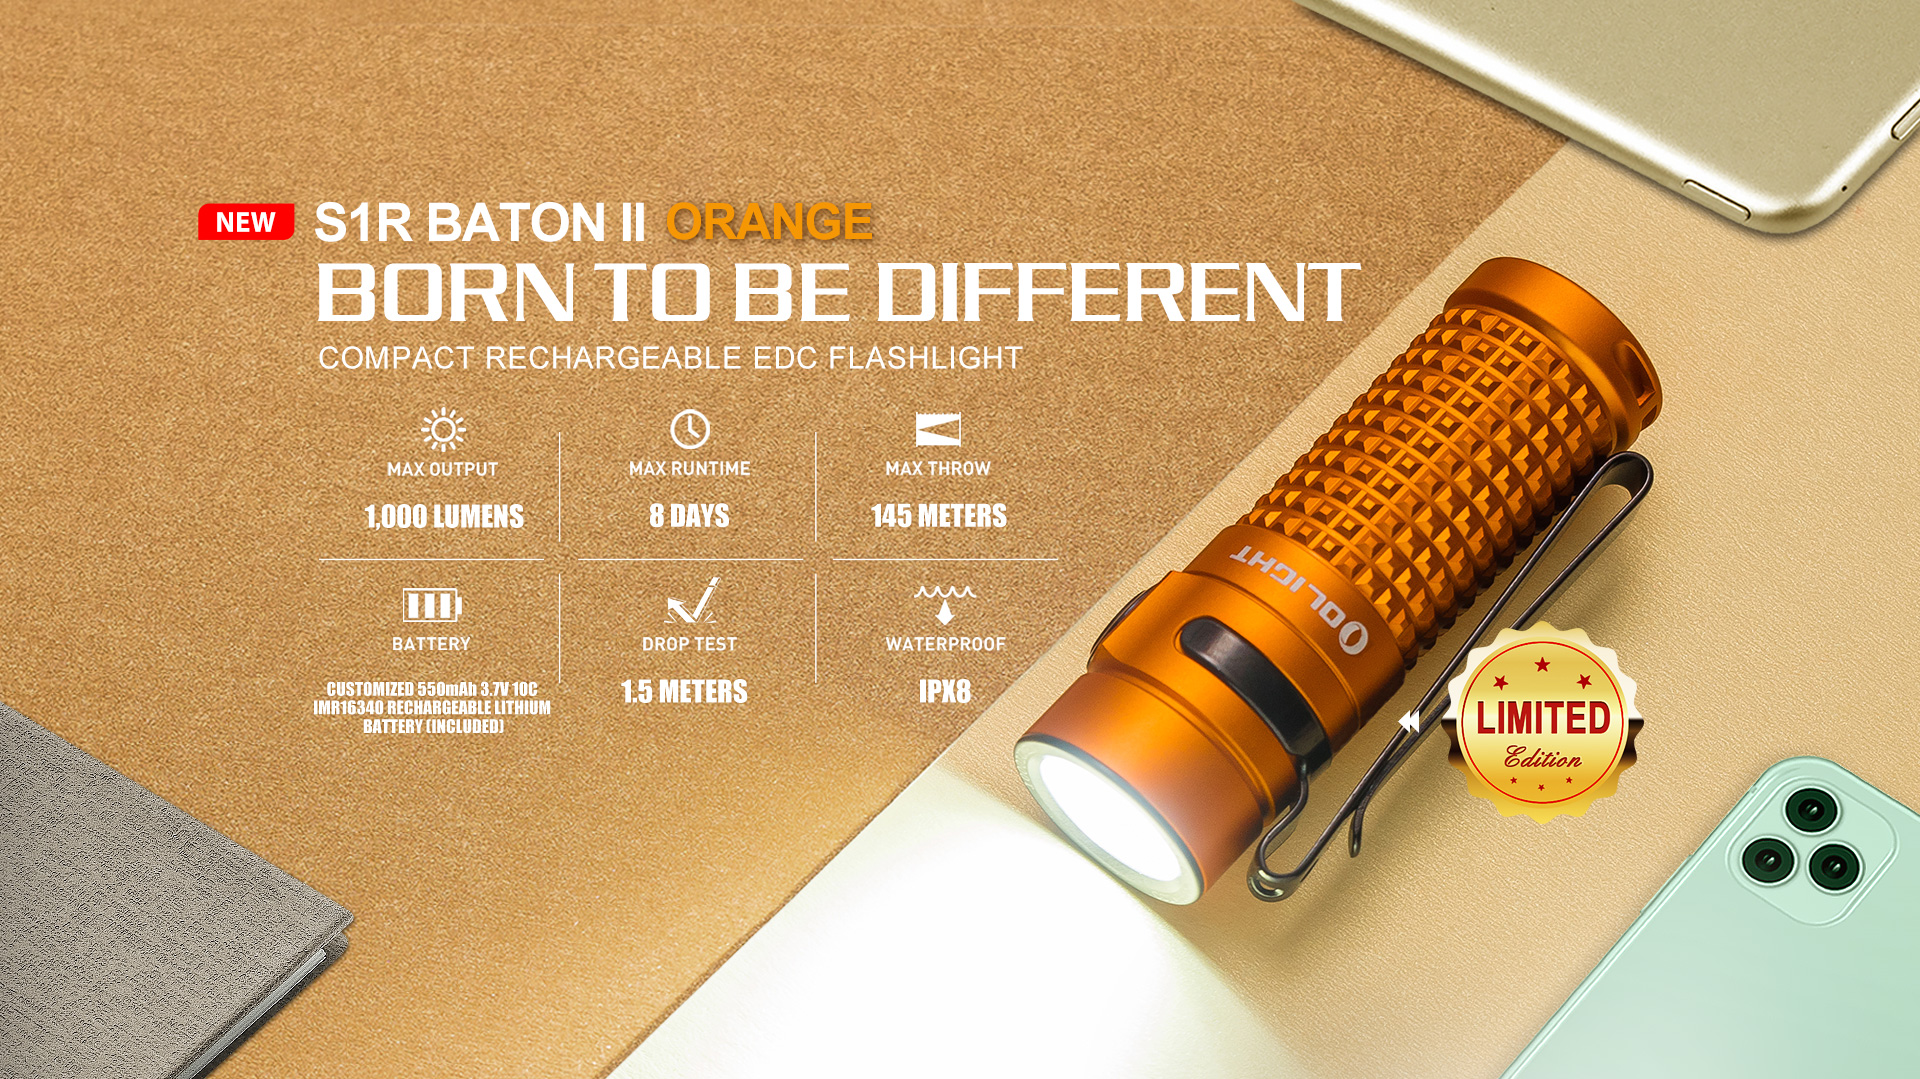 S1R Baton II Orange Limited Edition